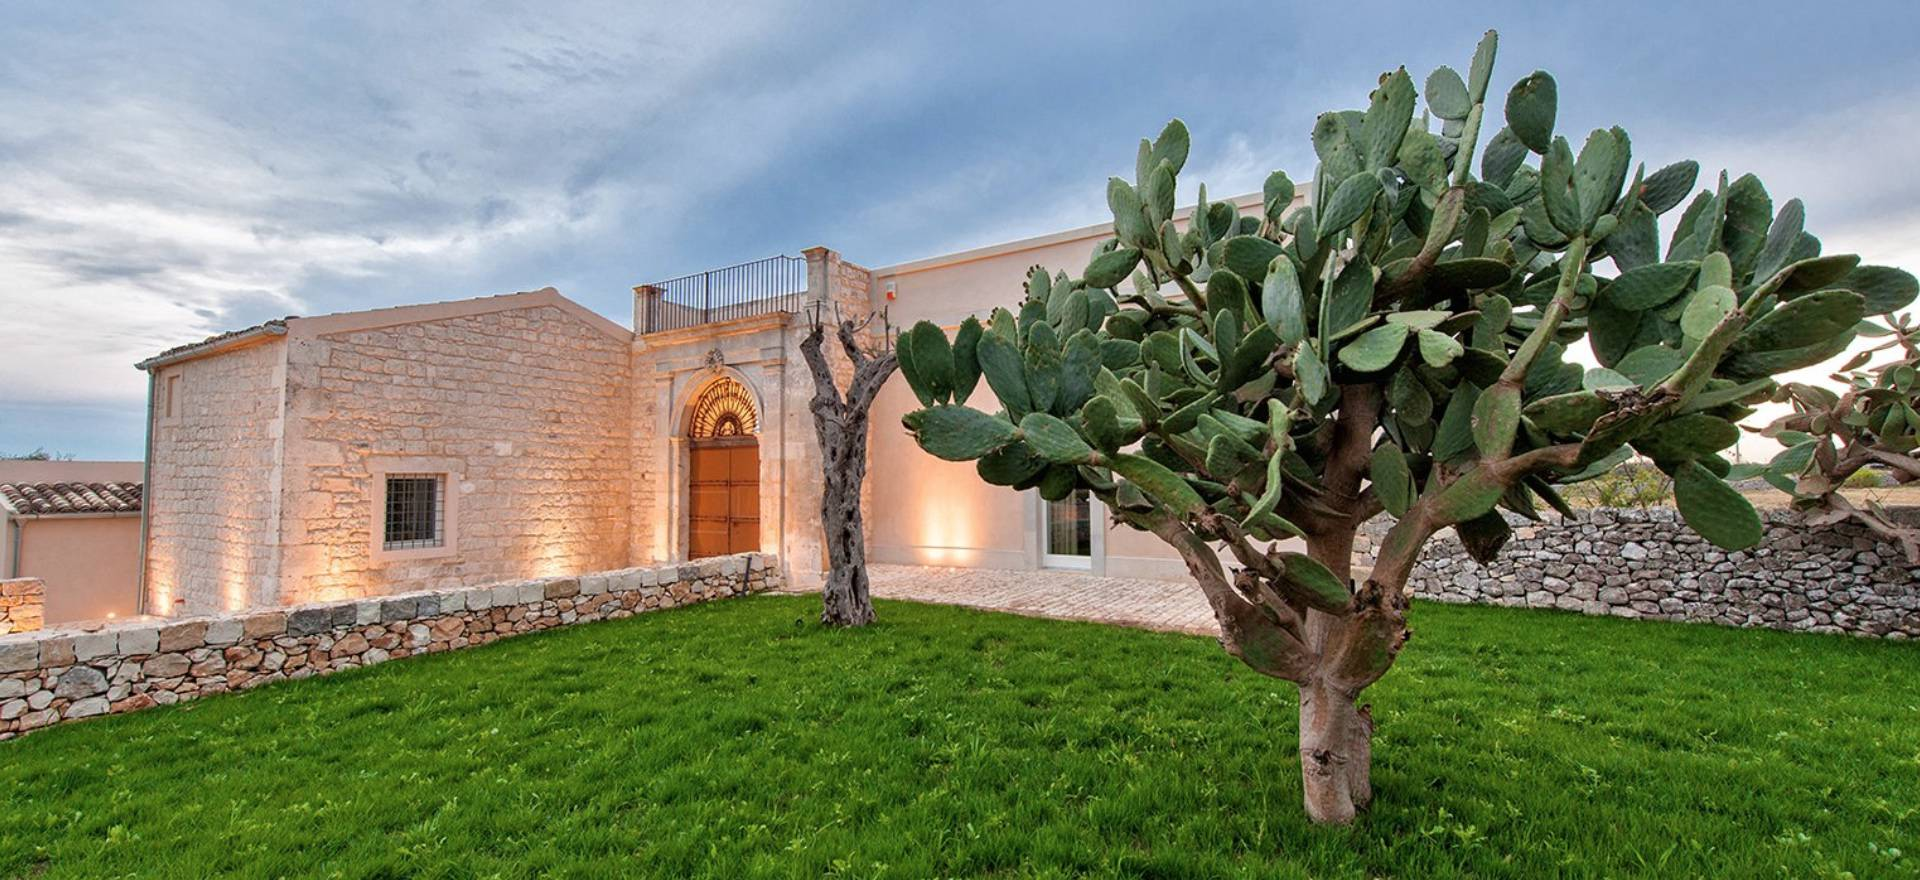 Agriturismo Sicilië Gerestaureerde agriturismo met goed Siciliaans restaurant